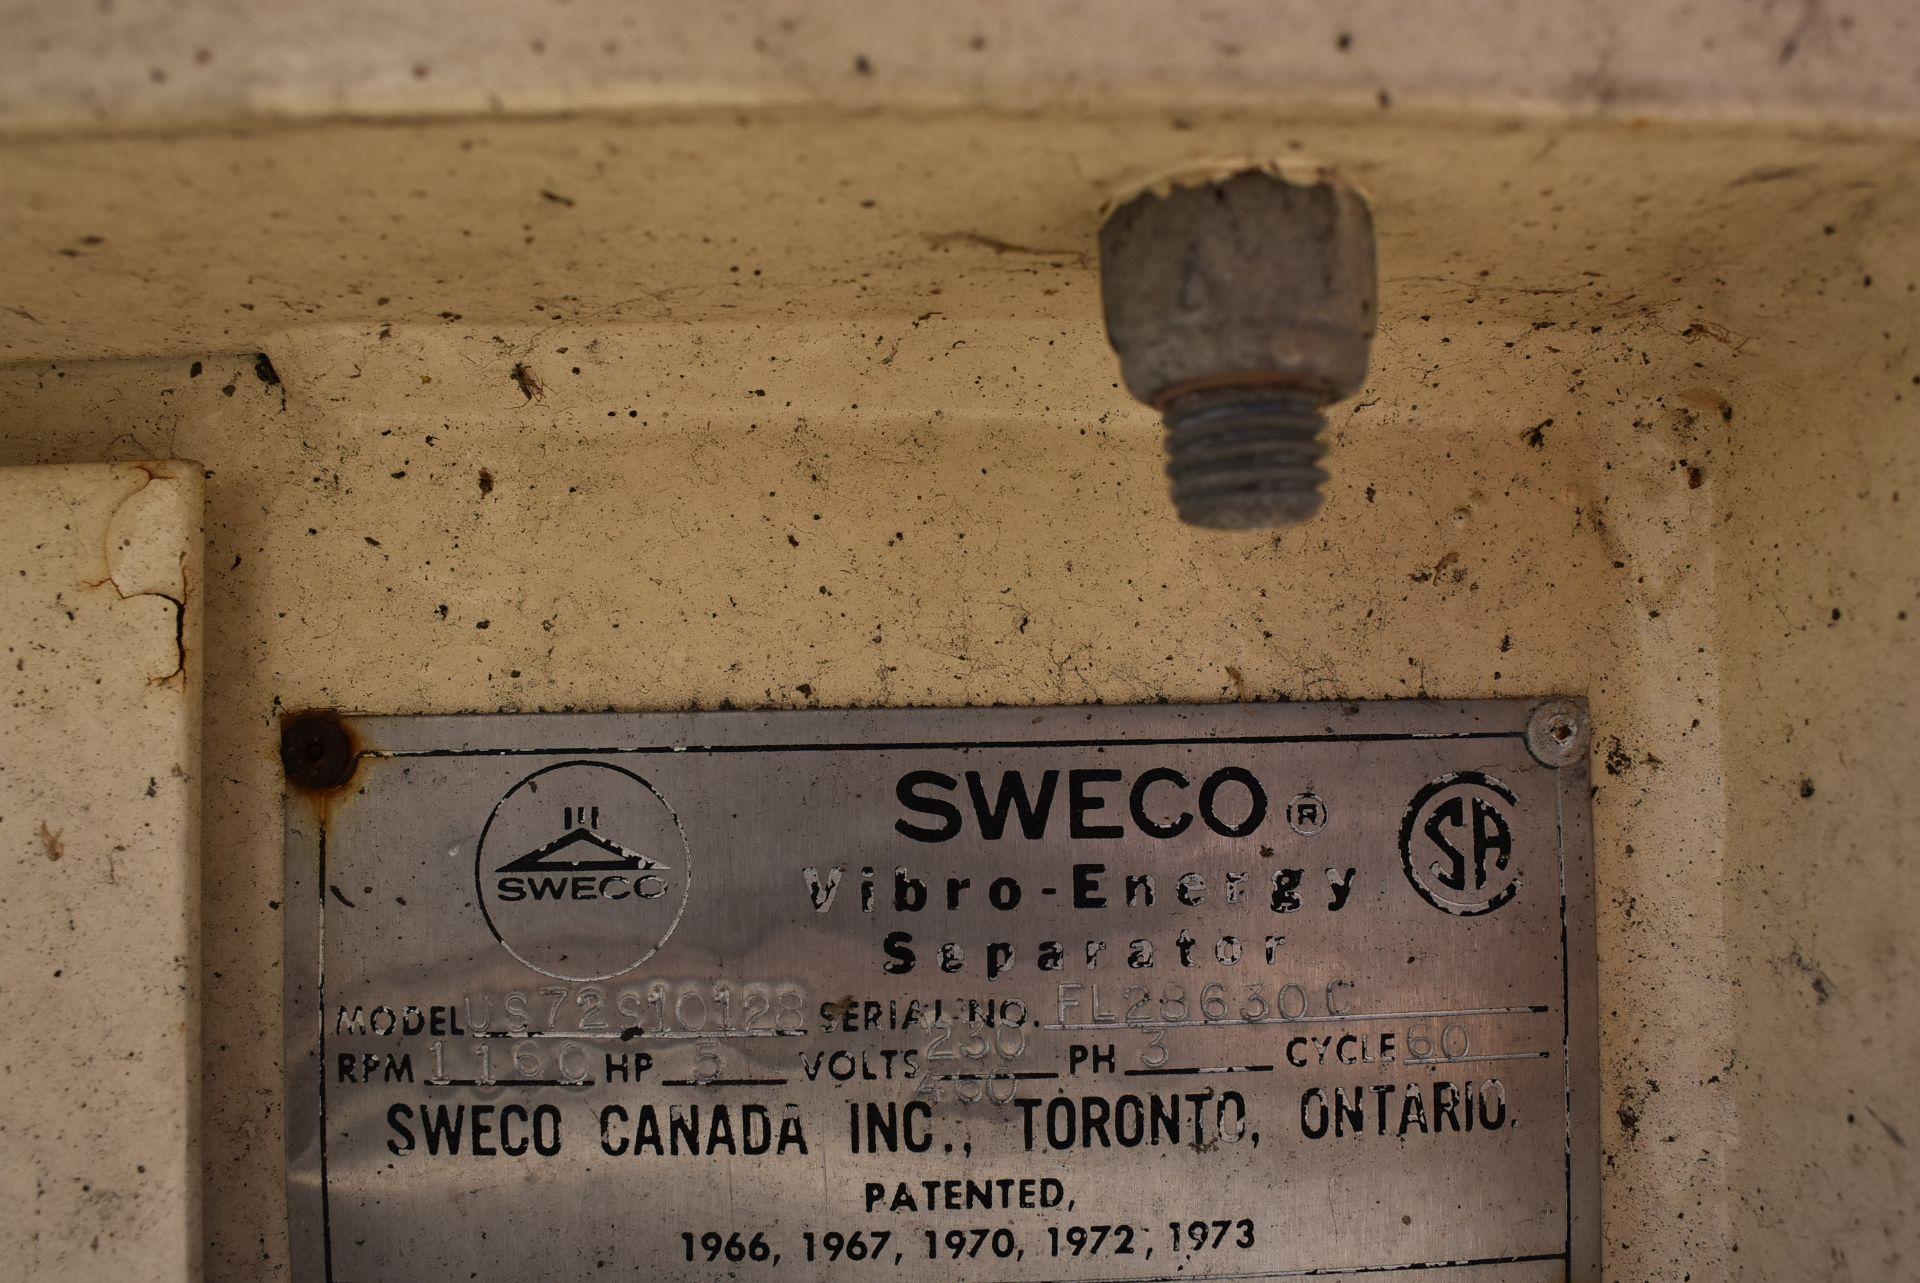 SWECO Model #US72510128 Vibratory Separator - Image 2 of 4